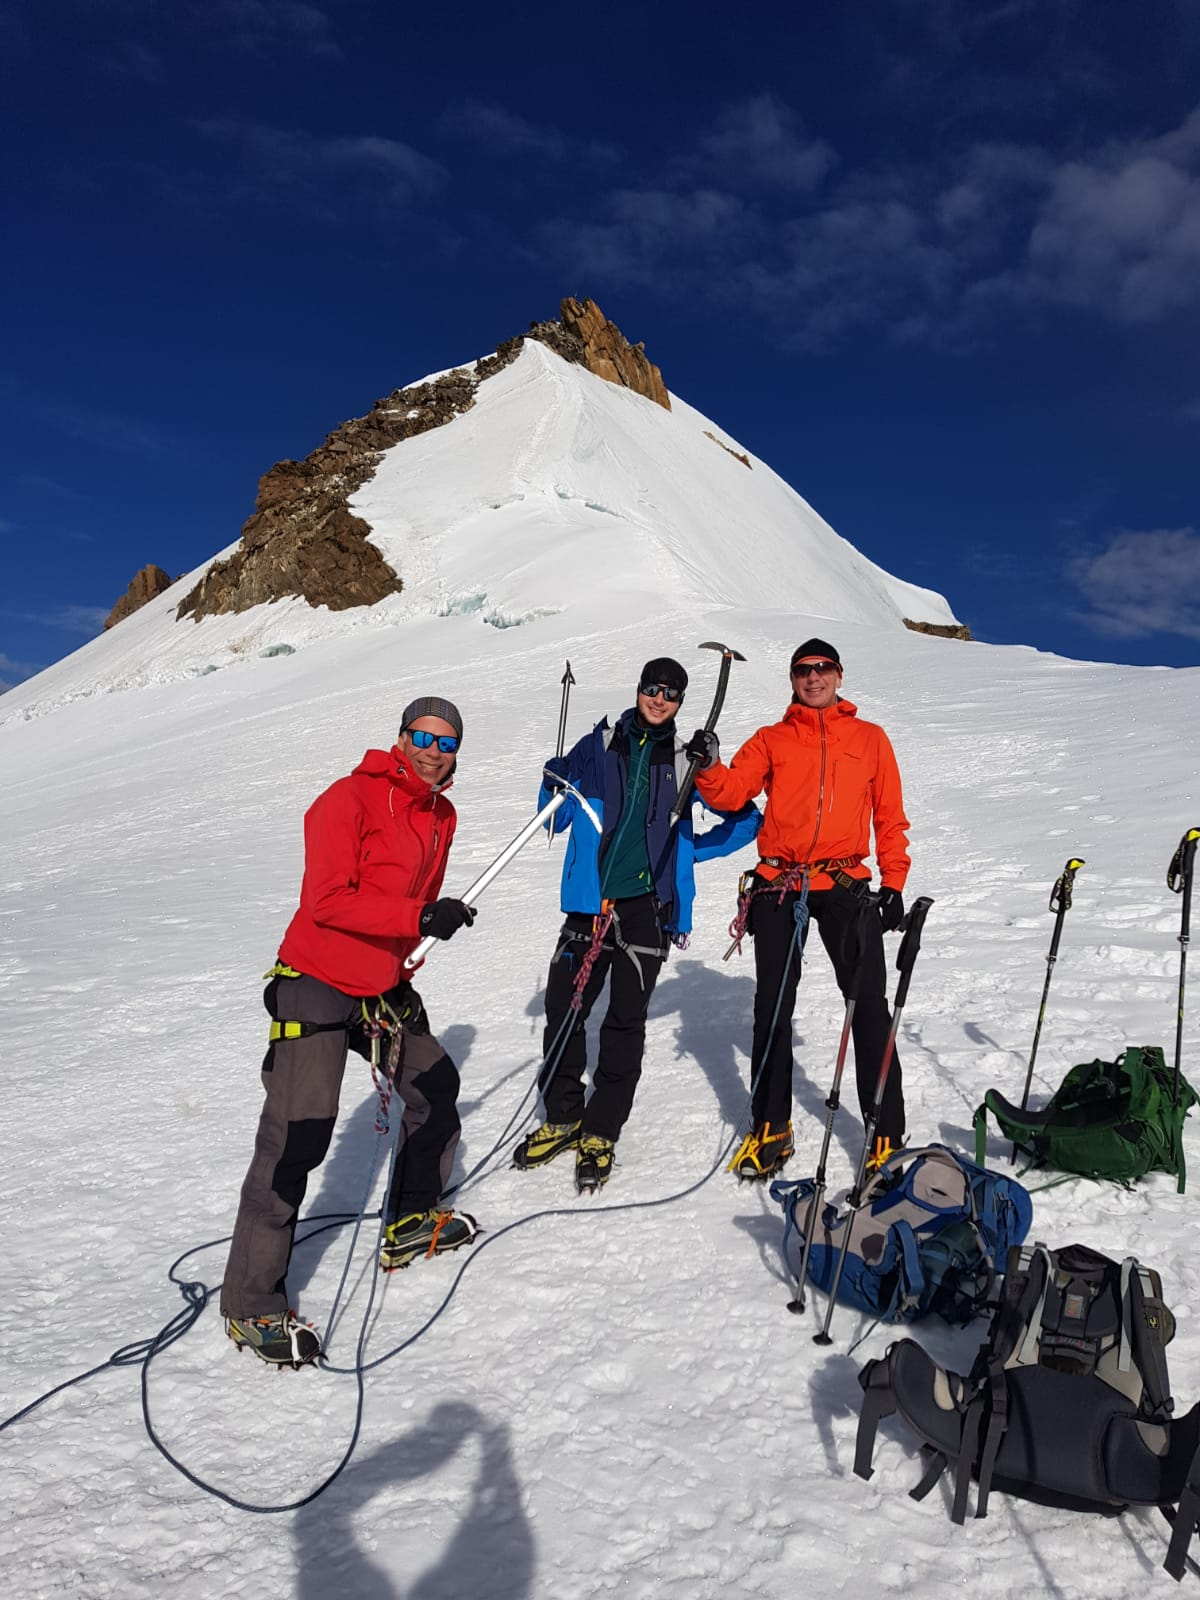 alpinisme-camping-tignes-(73320)-tente-montagne-vacances